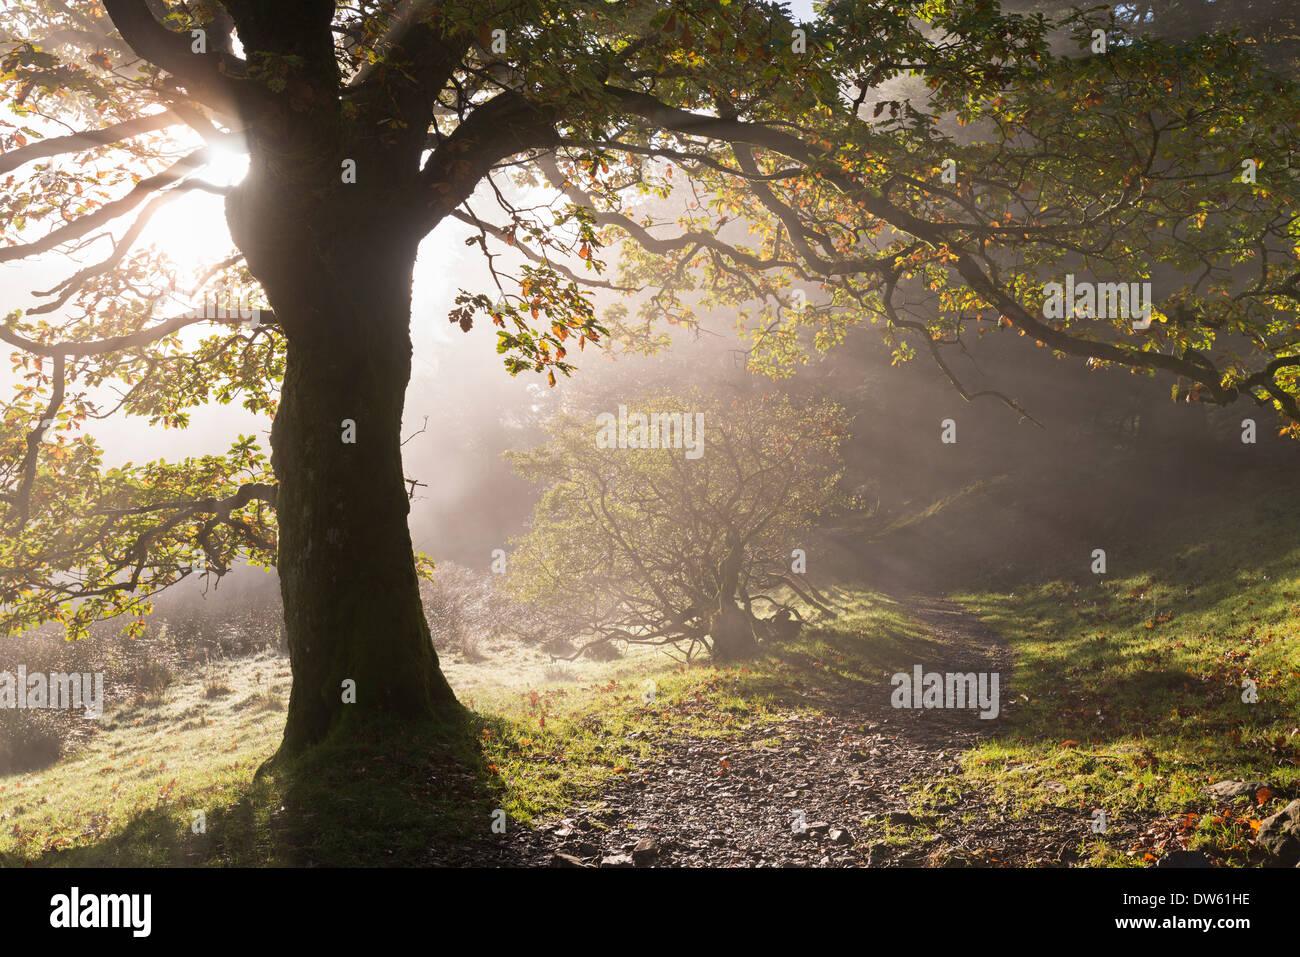 Lake District sinueuse à travers bois, sentier Holme Loweswater, Cumbria, Angleterre. L'automne (novembre) 2013. Photo Stock